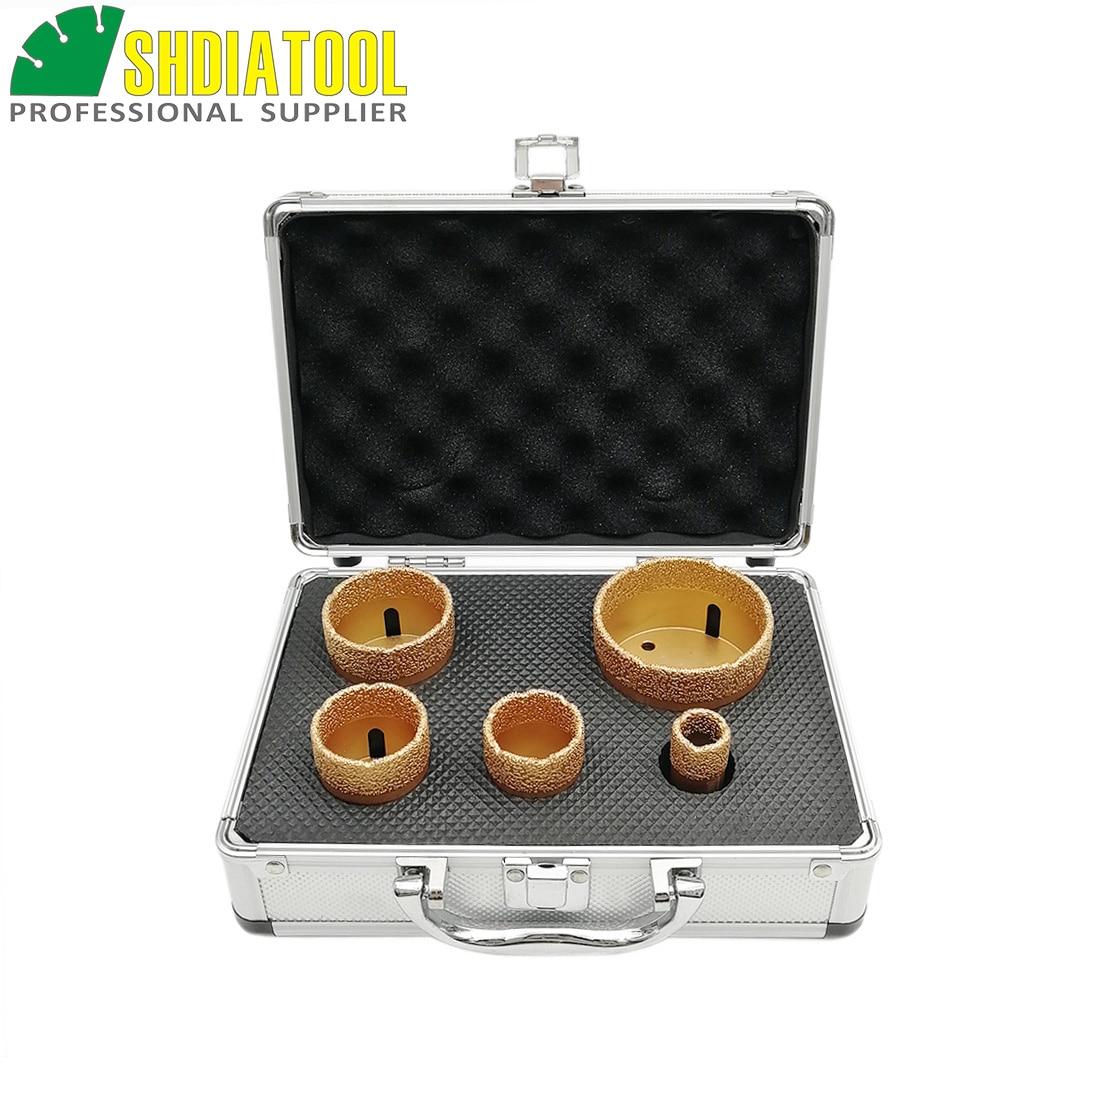 SHDIATOOL 1set M14 Vacuum Brazed Diamond Drilling Bits With Box Dia 20+35+40+50+68mm Granite Marble Ceramic Hole Saw Core Bits